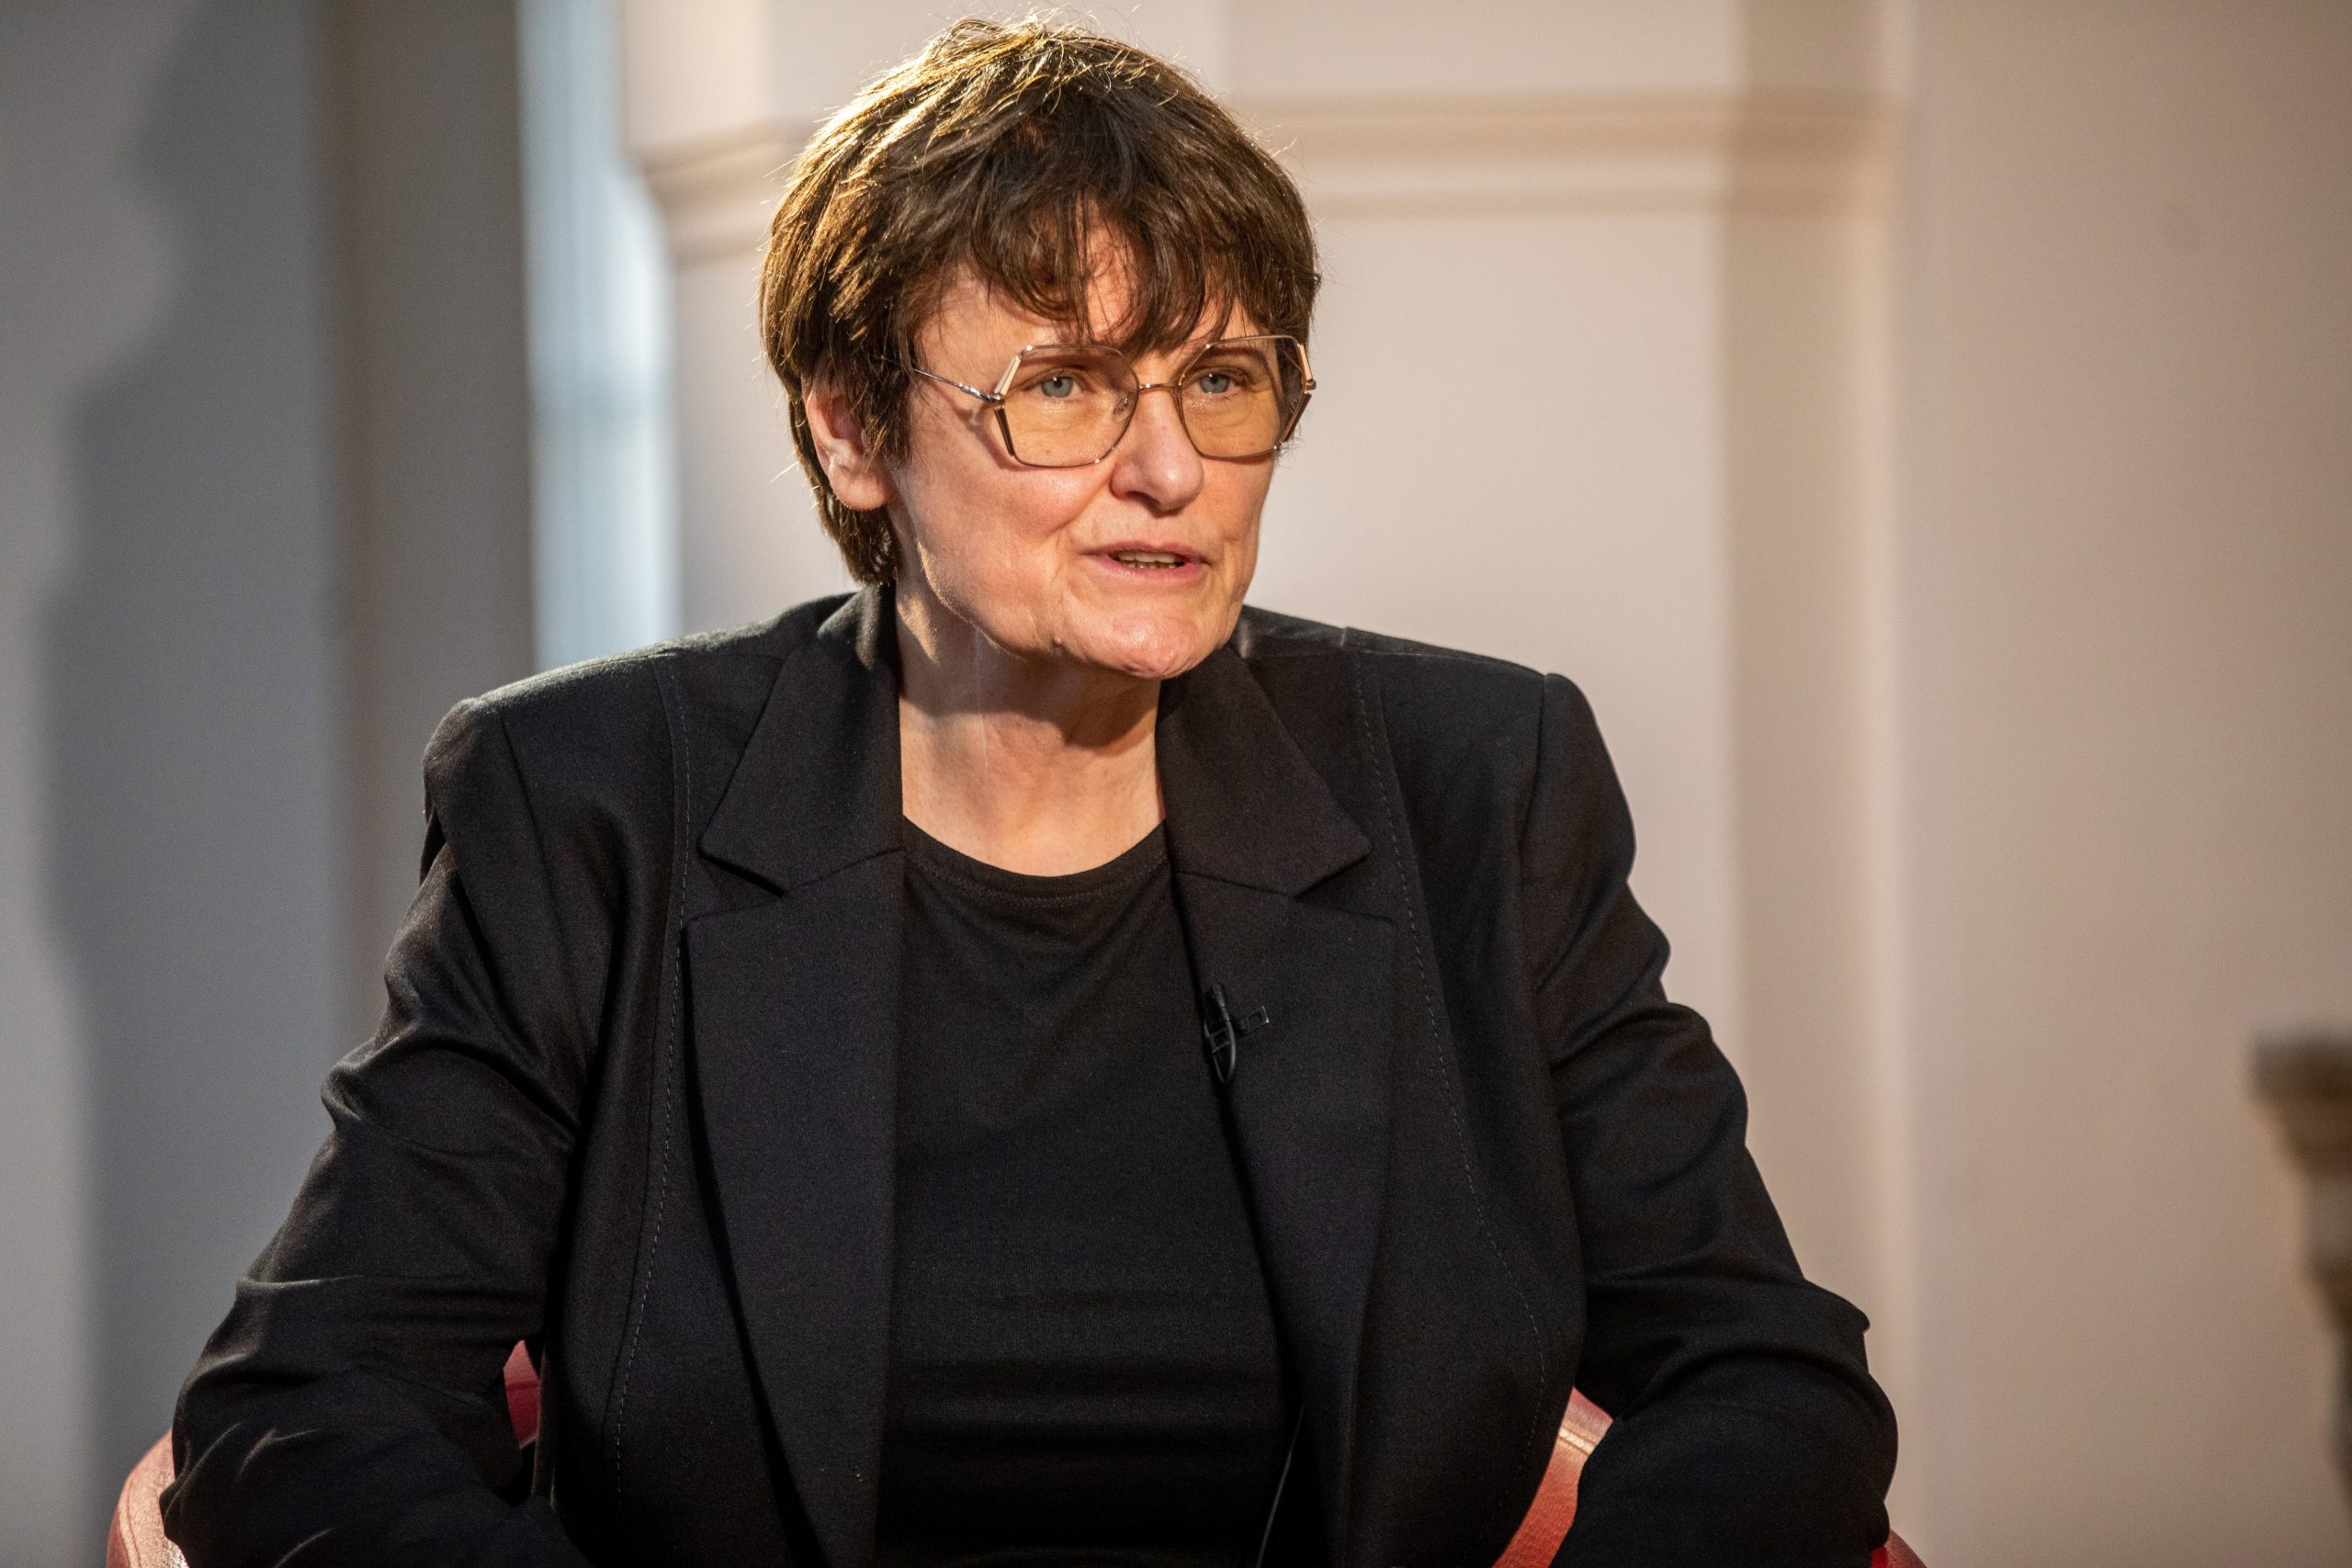 Katalin Karikó erhält renommierten Lasker-Preis